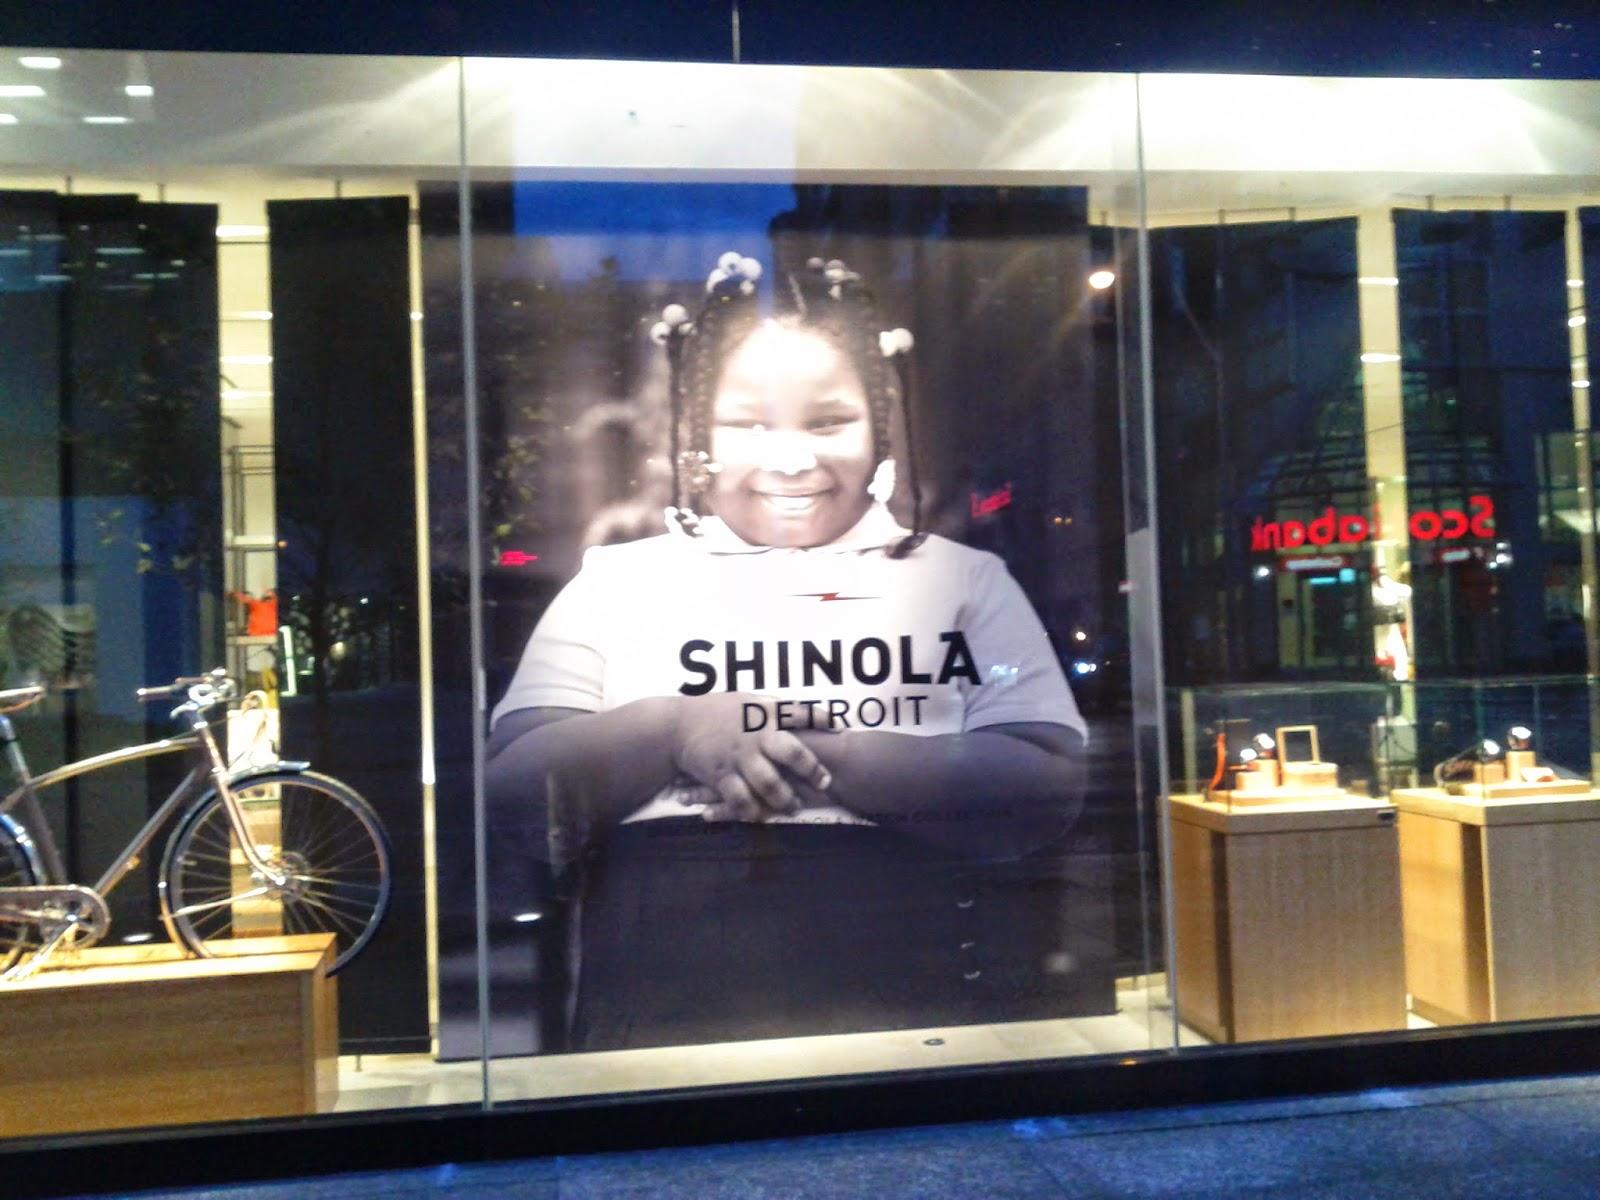 Shinola Detroit